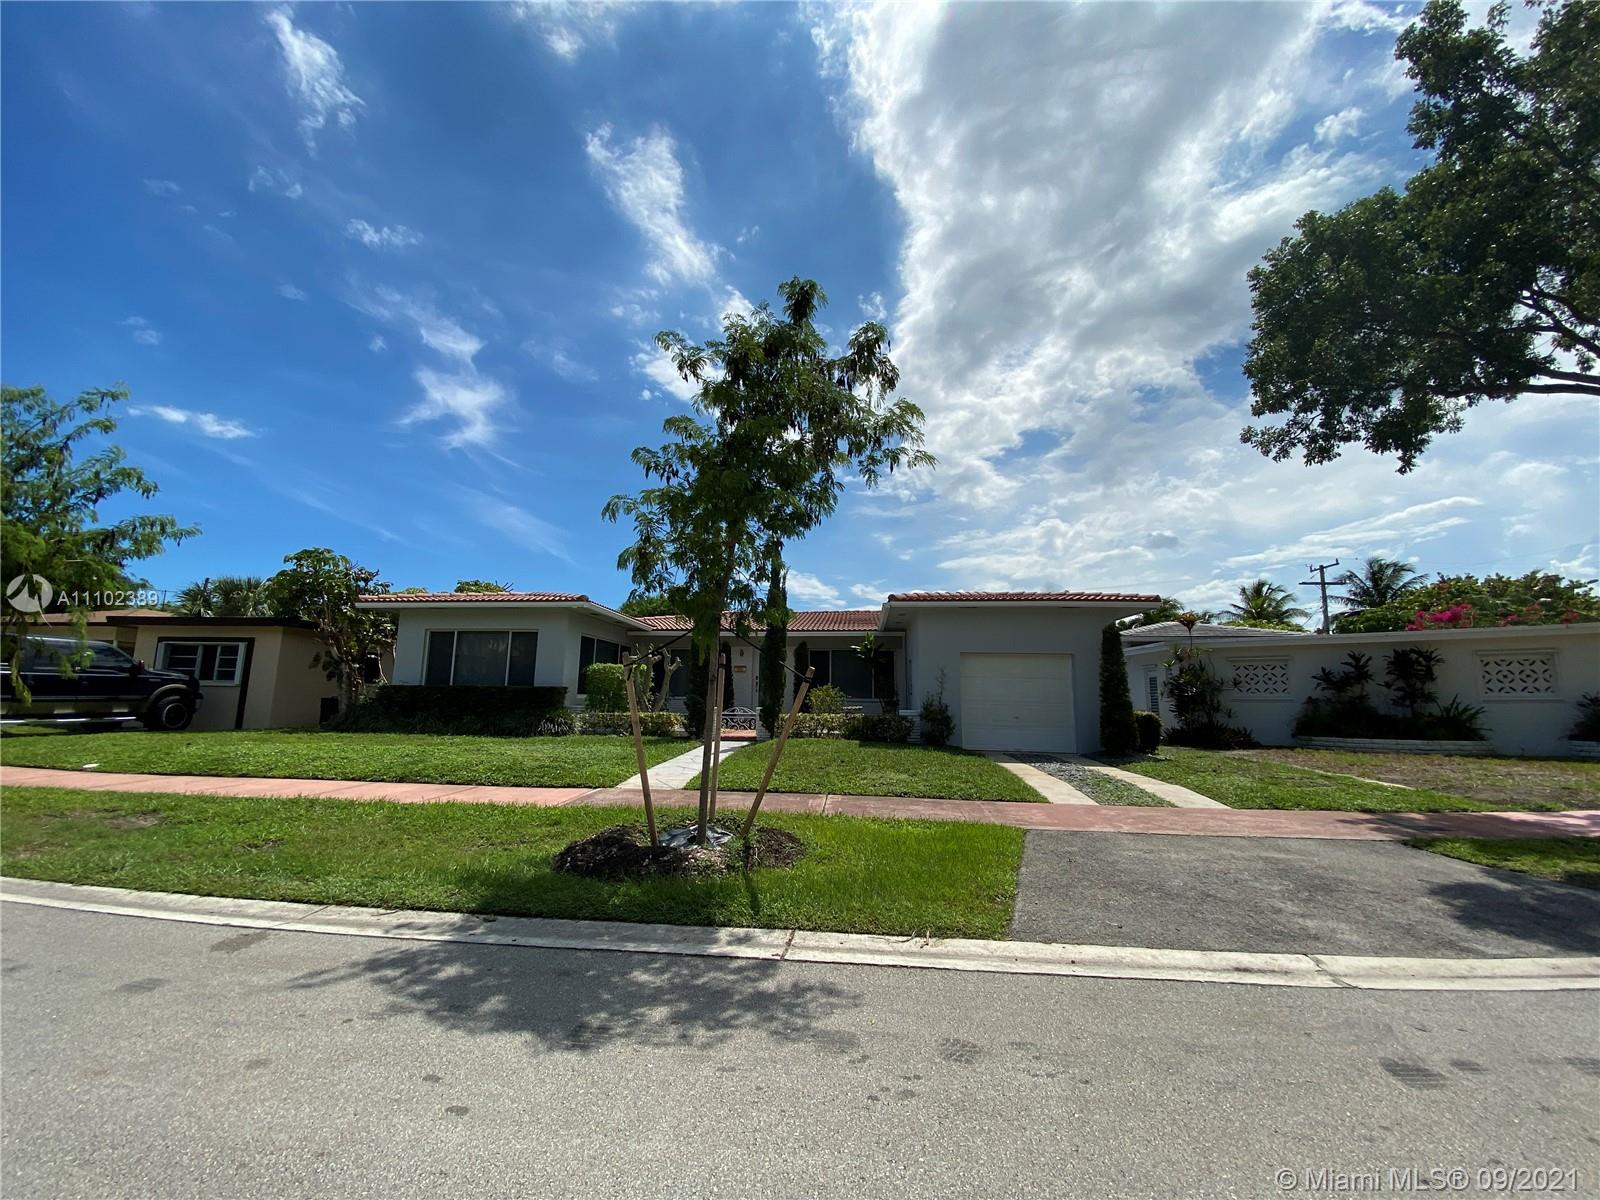 Single Family Home,For Sale,430 N Shore Dr, Miami Beach, Florida 33141,Brickell,realty,broker,condos near me